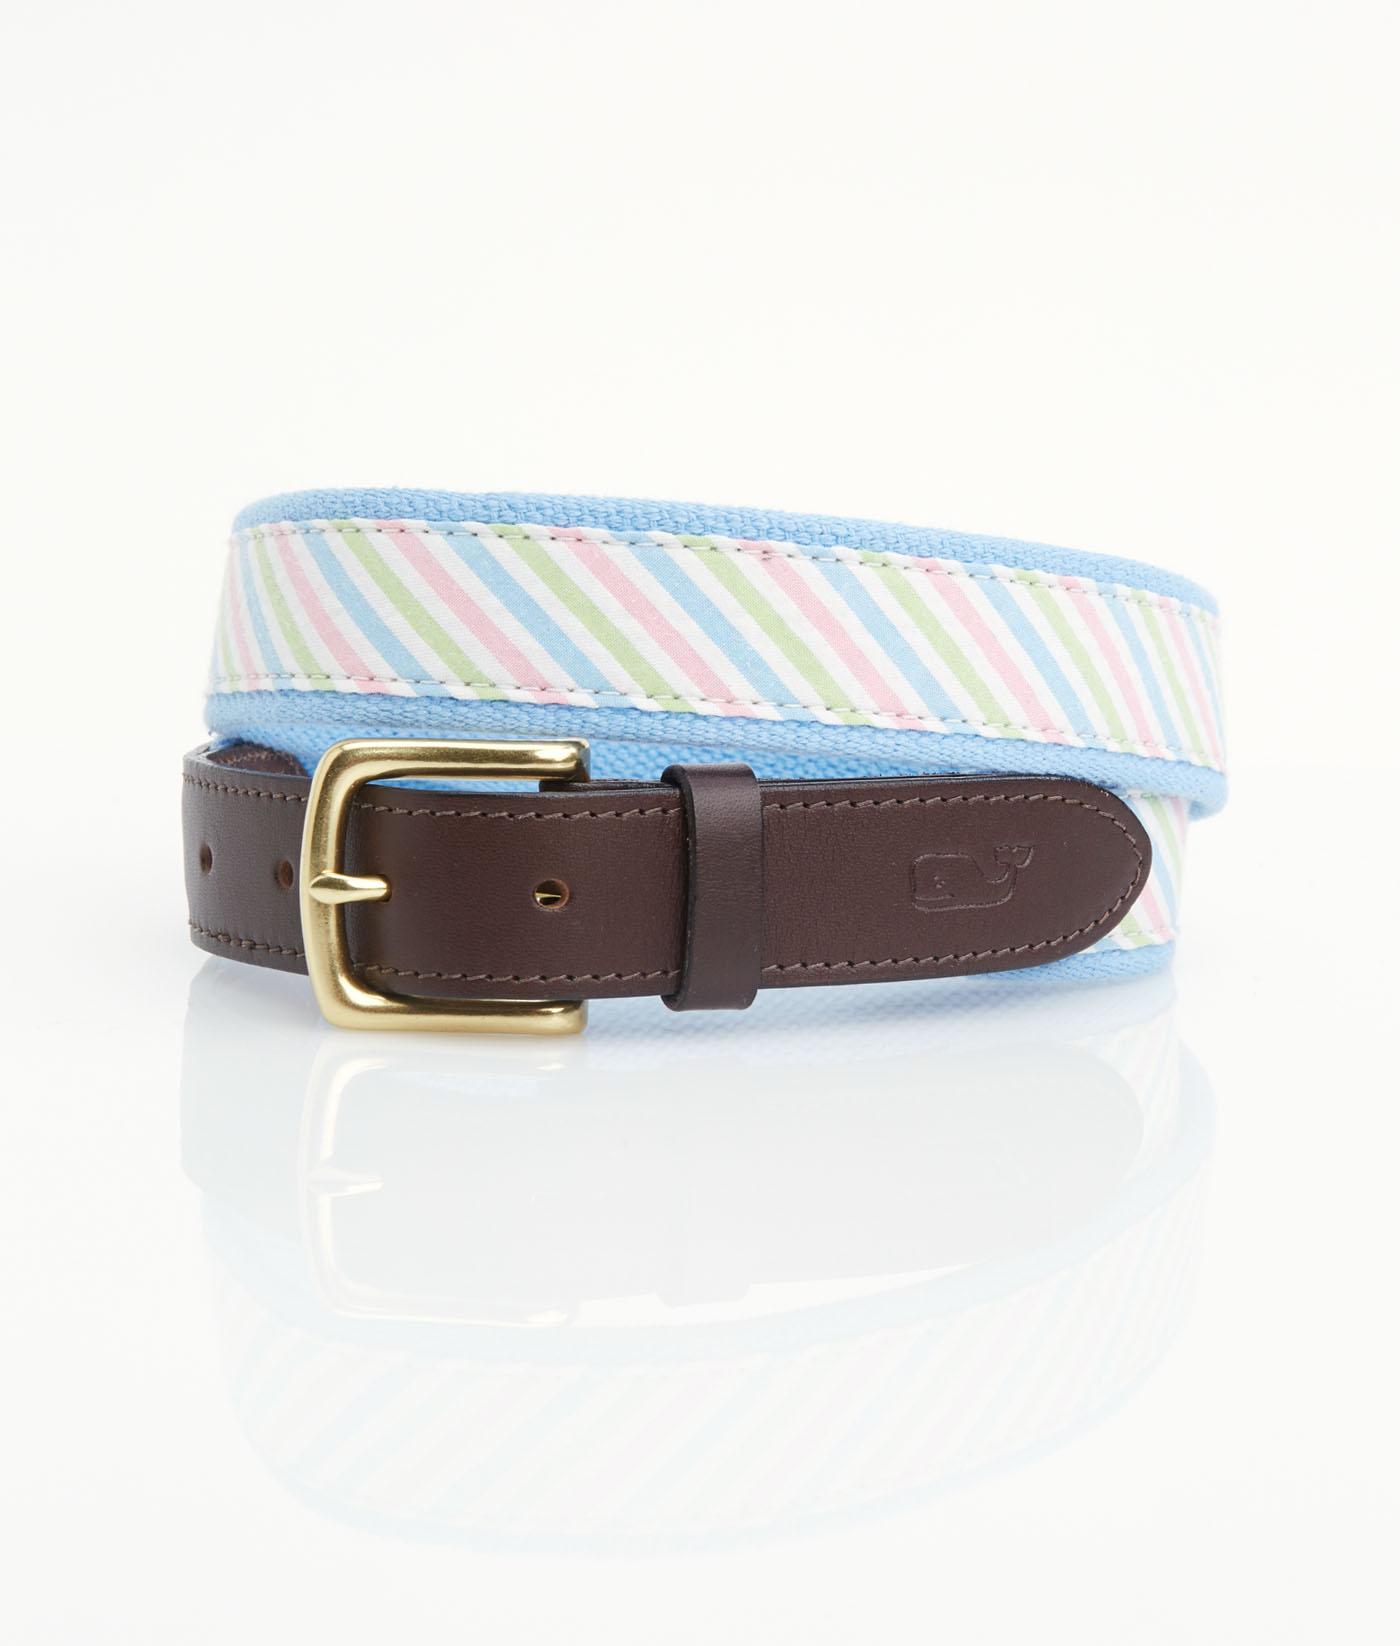 Three-Color Seersucker Belt,1A1003-998 MULT